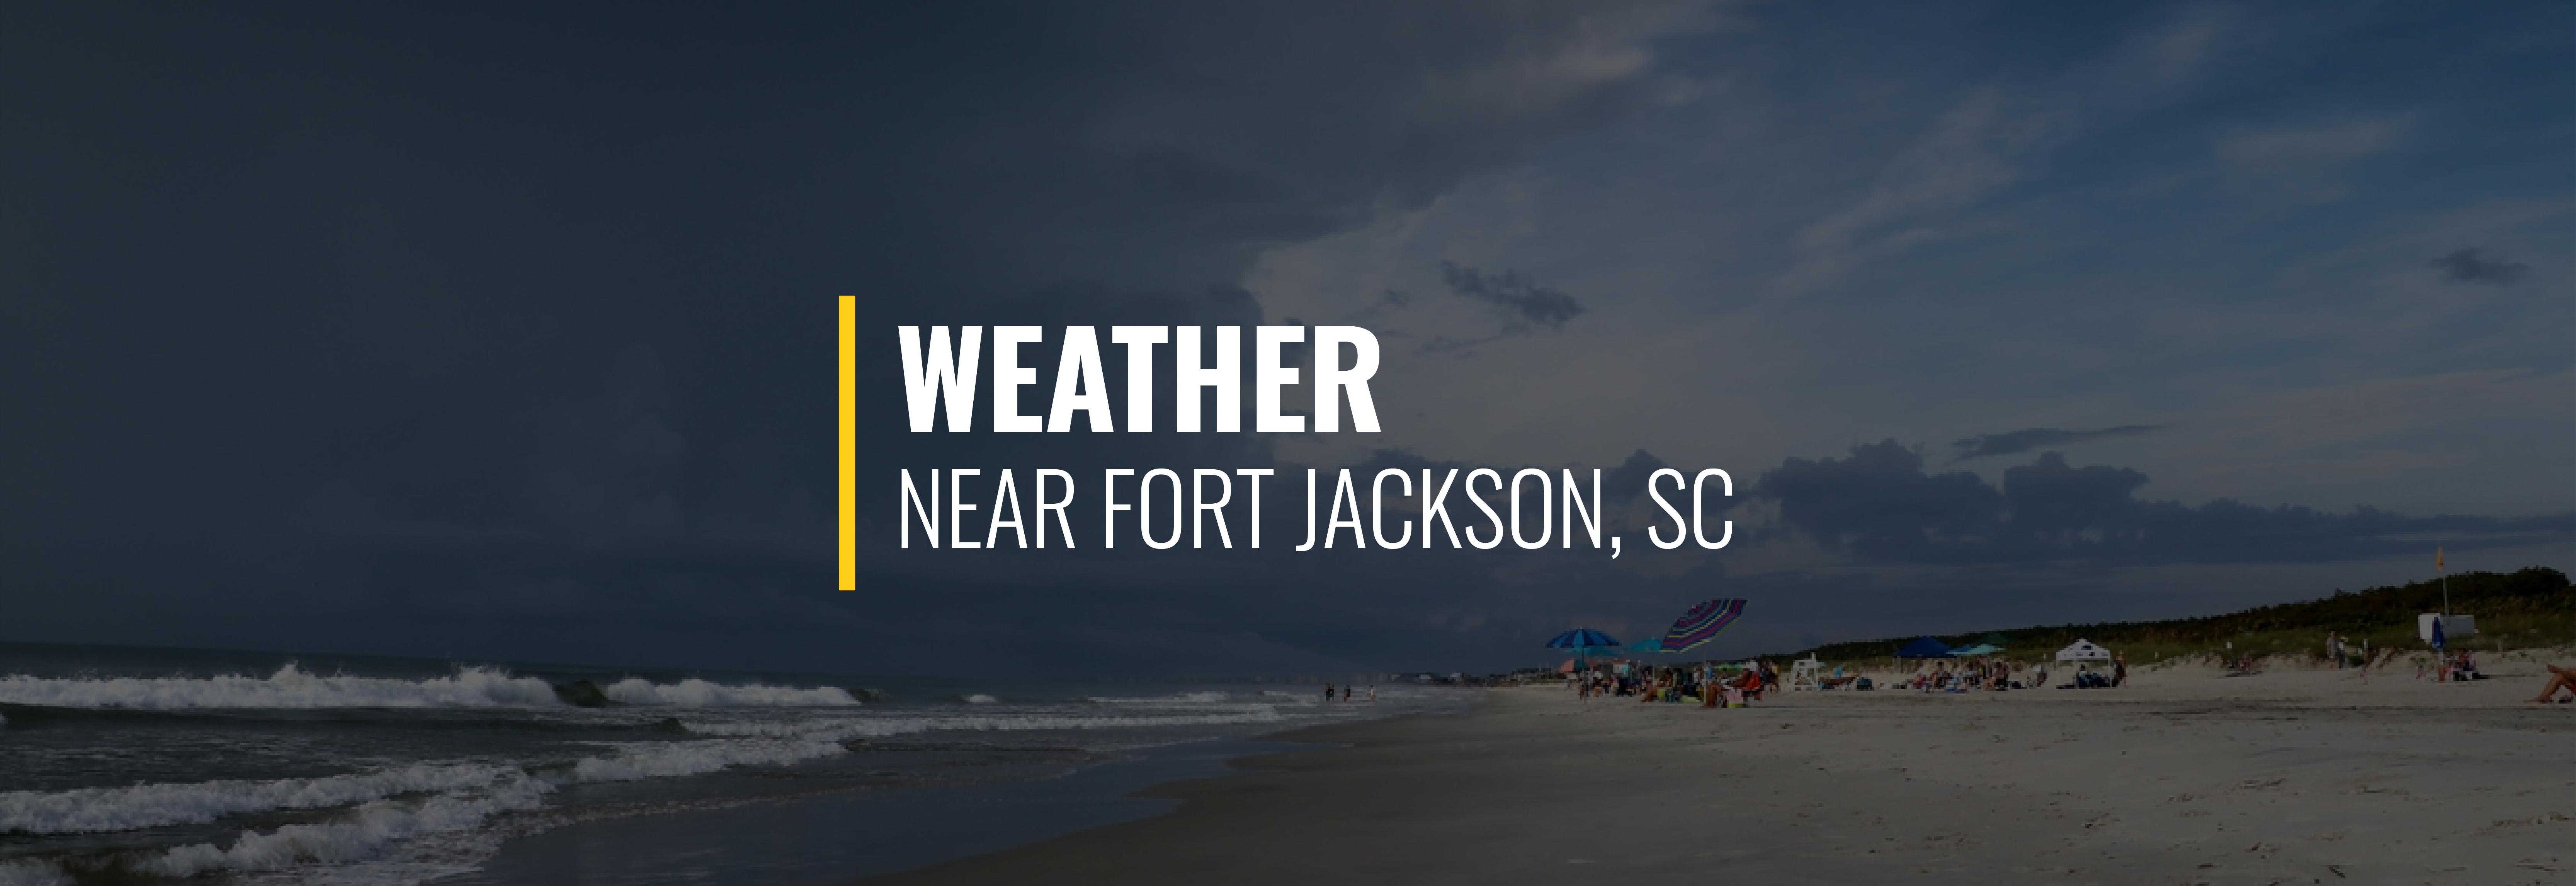 Fort Jackson SC Weather